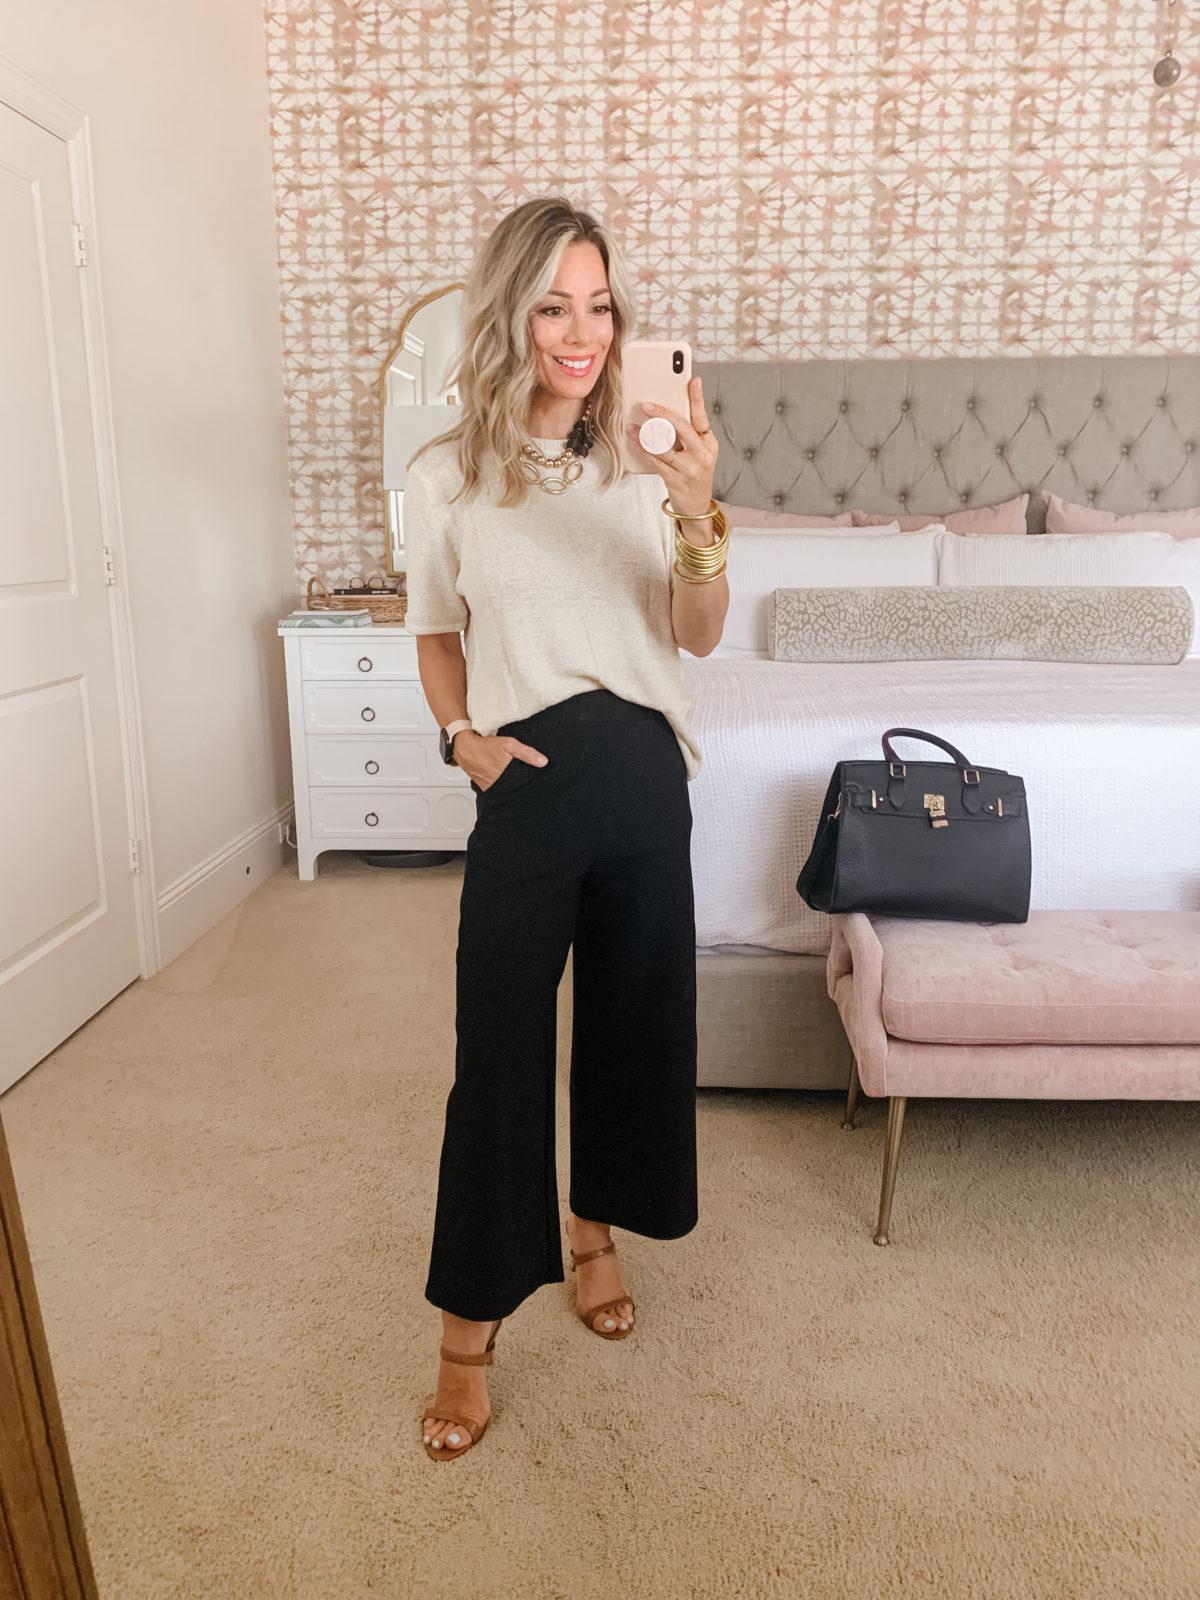 Amazon Fashion Faves, Sweater, Pants, Tote Bag